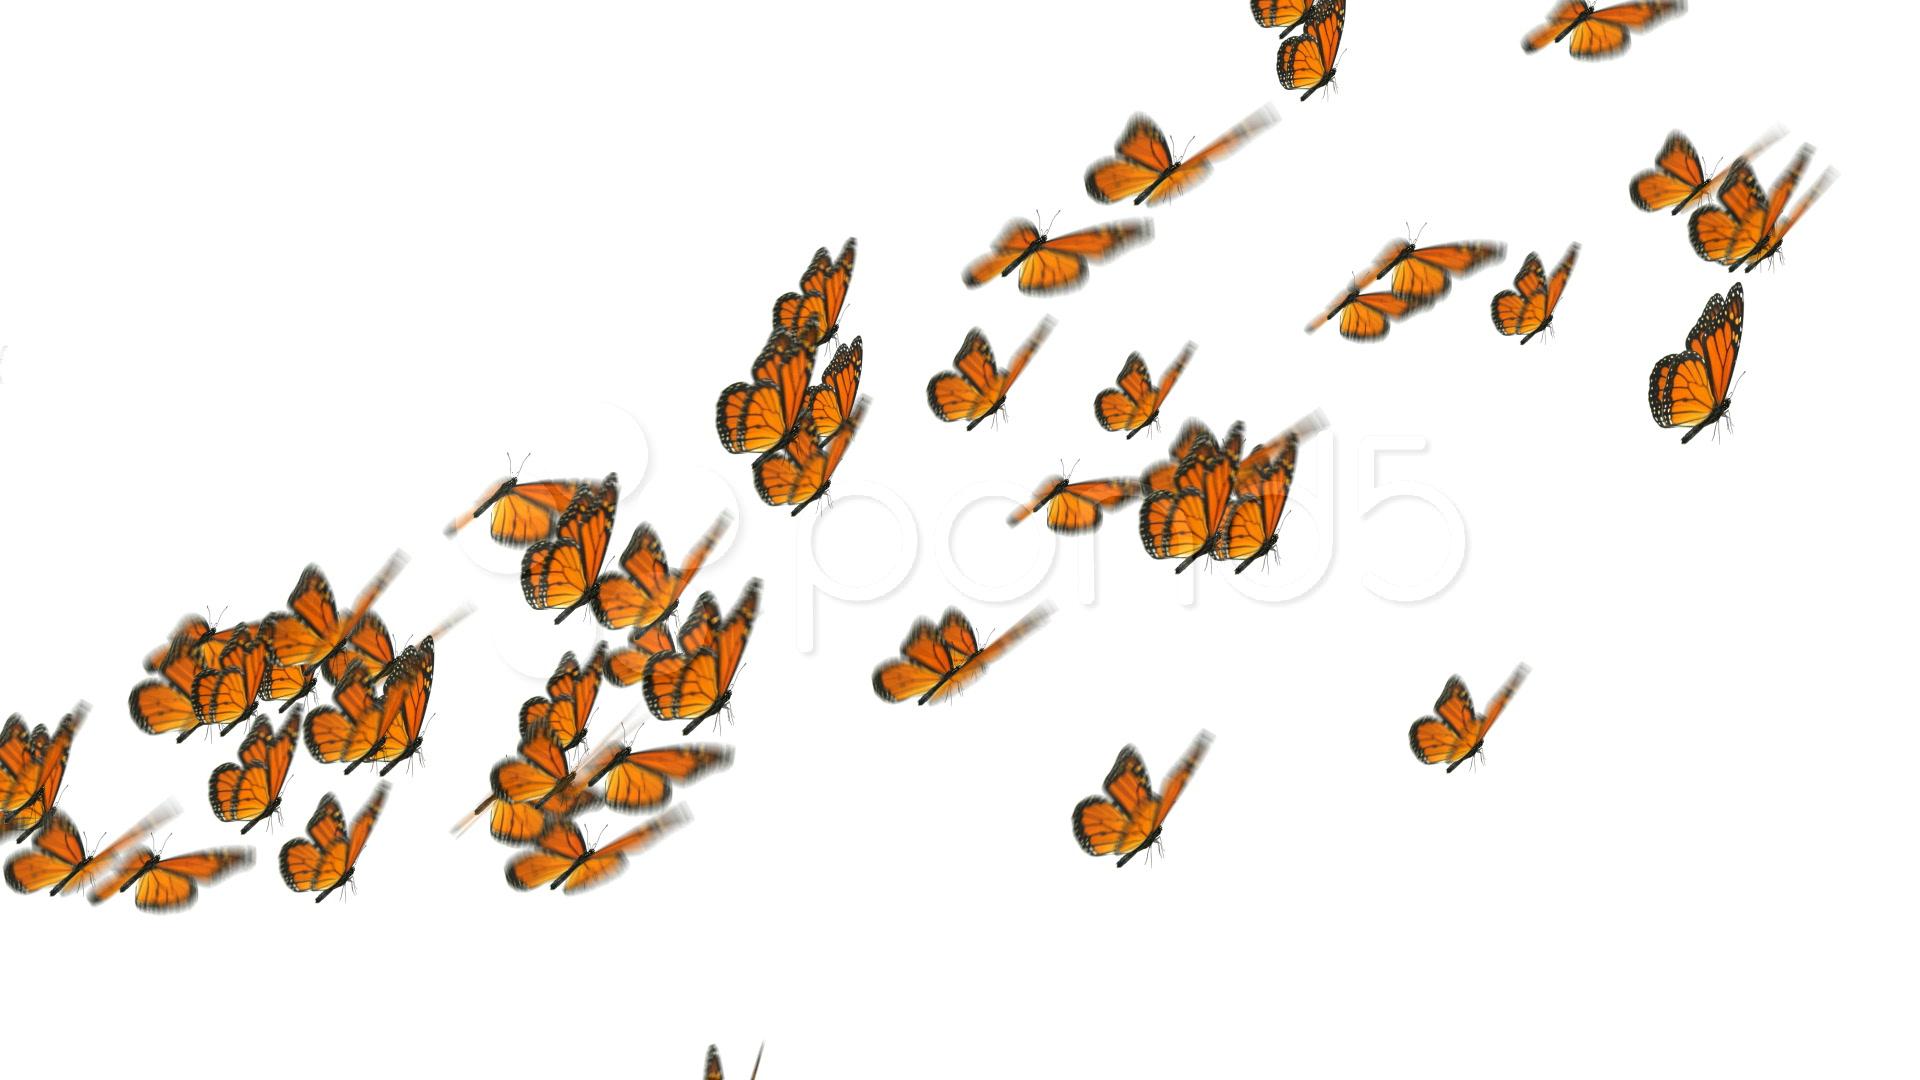 Monarch butterflies flying away - photo#38